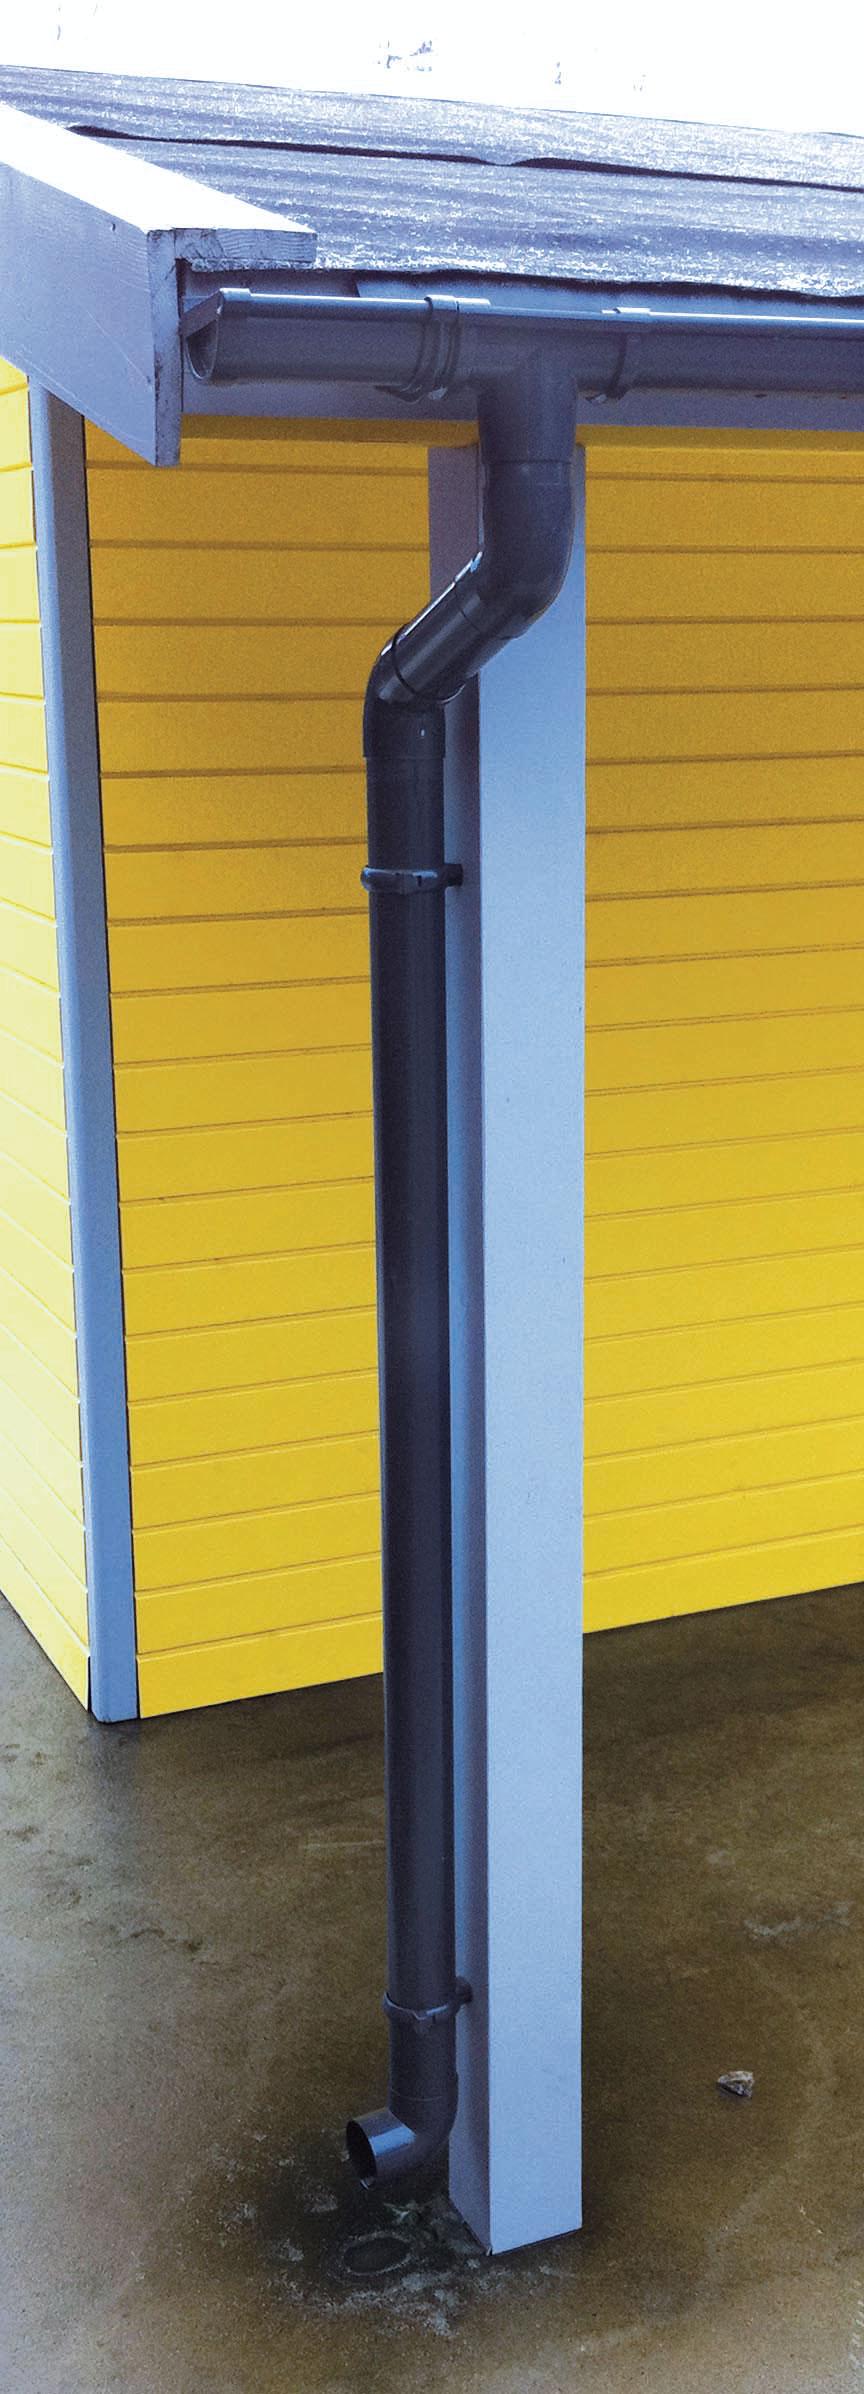 Dachrinnen Ergänzungsset RG80 410A Anbauten Metall Halter anthrazit Bild 1